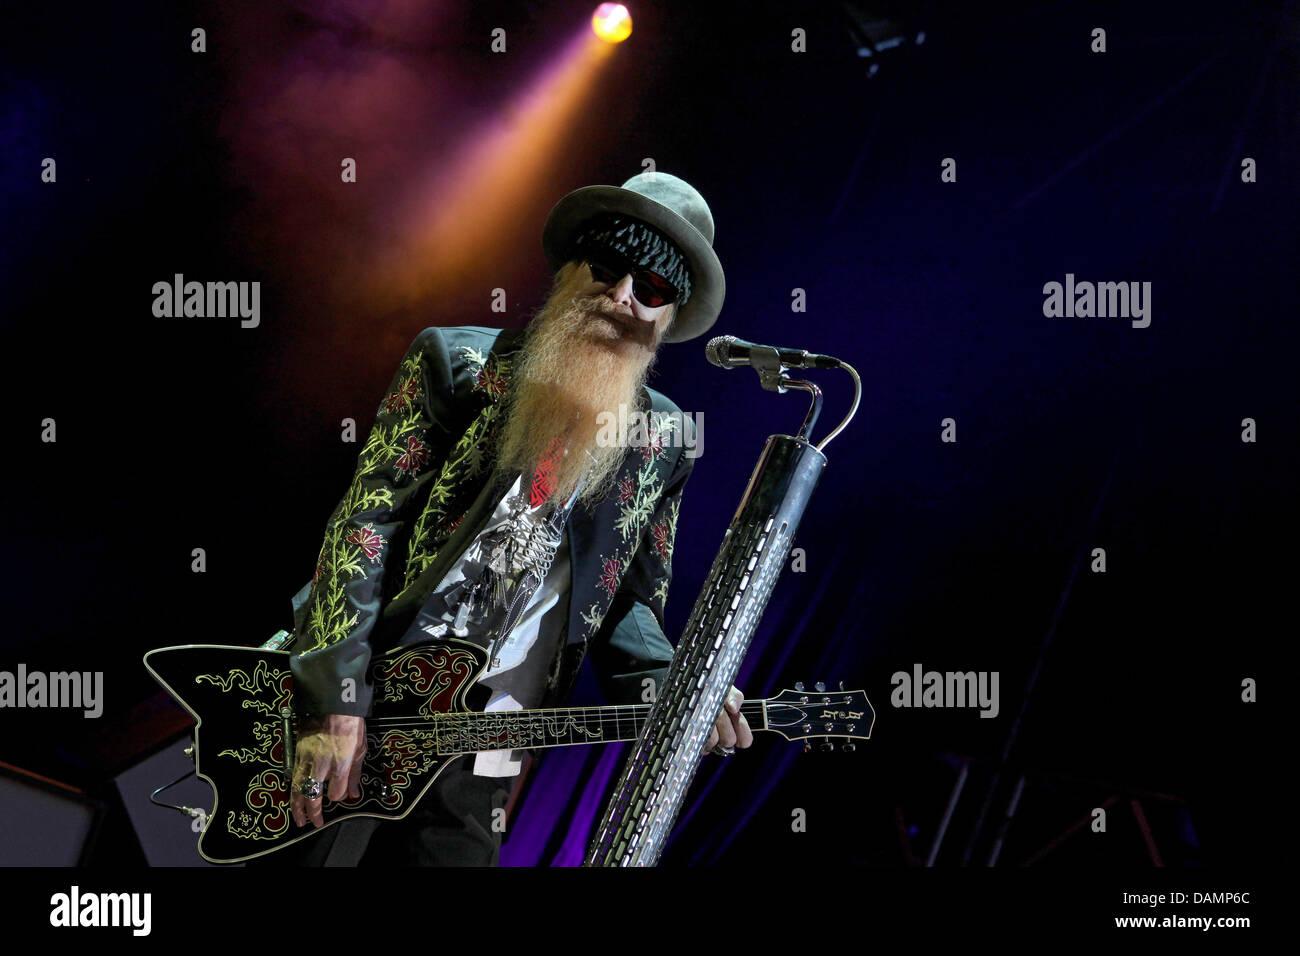 American rocker Gibbons Billy